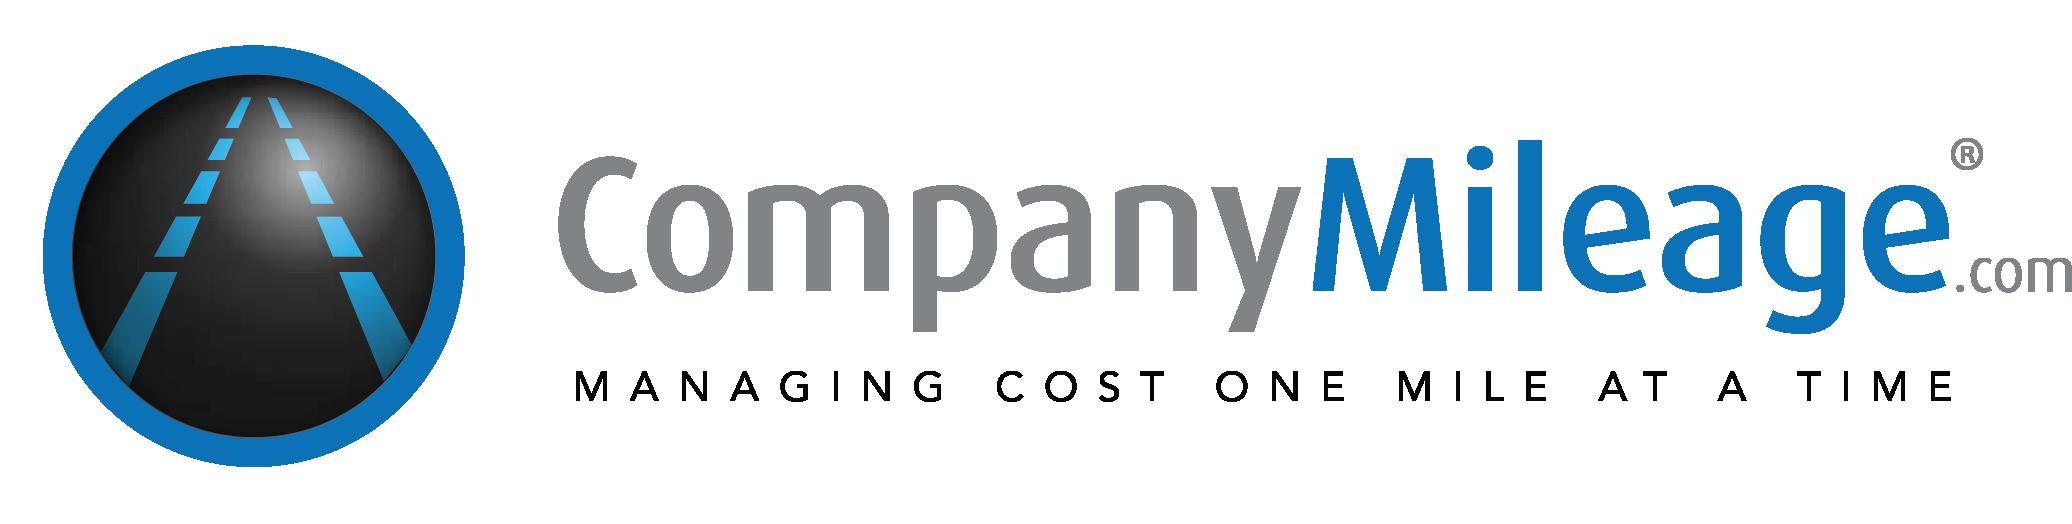 The Basics of Employee Mileage Reimbursement Law | CompanyMileage